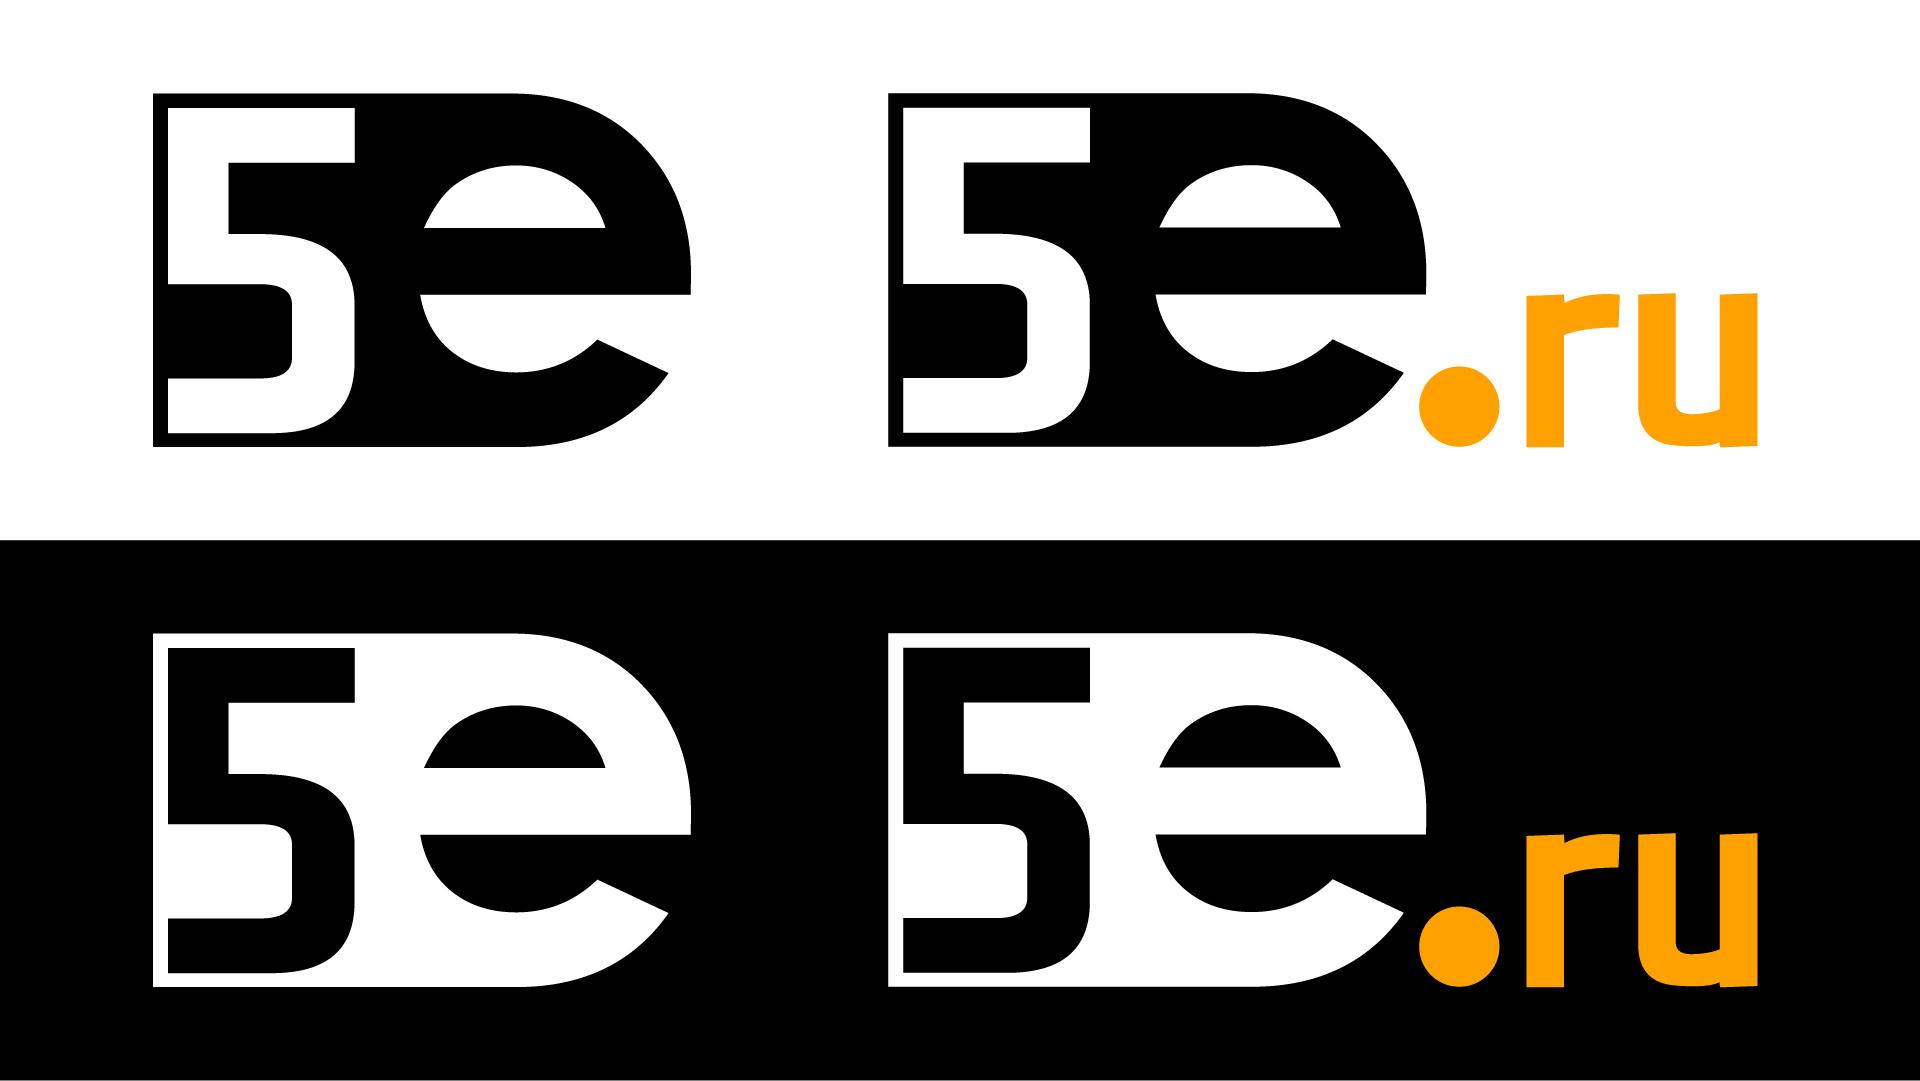 Нарисовать логотип для группы компаний  фото f_7215cdbae5a01f53.jpg